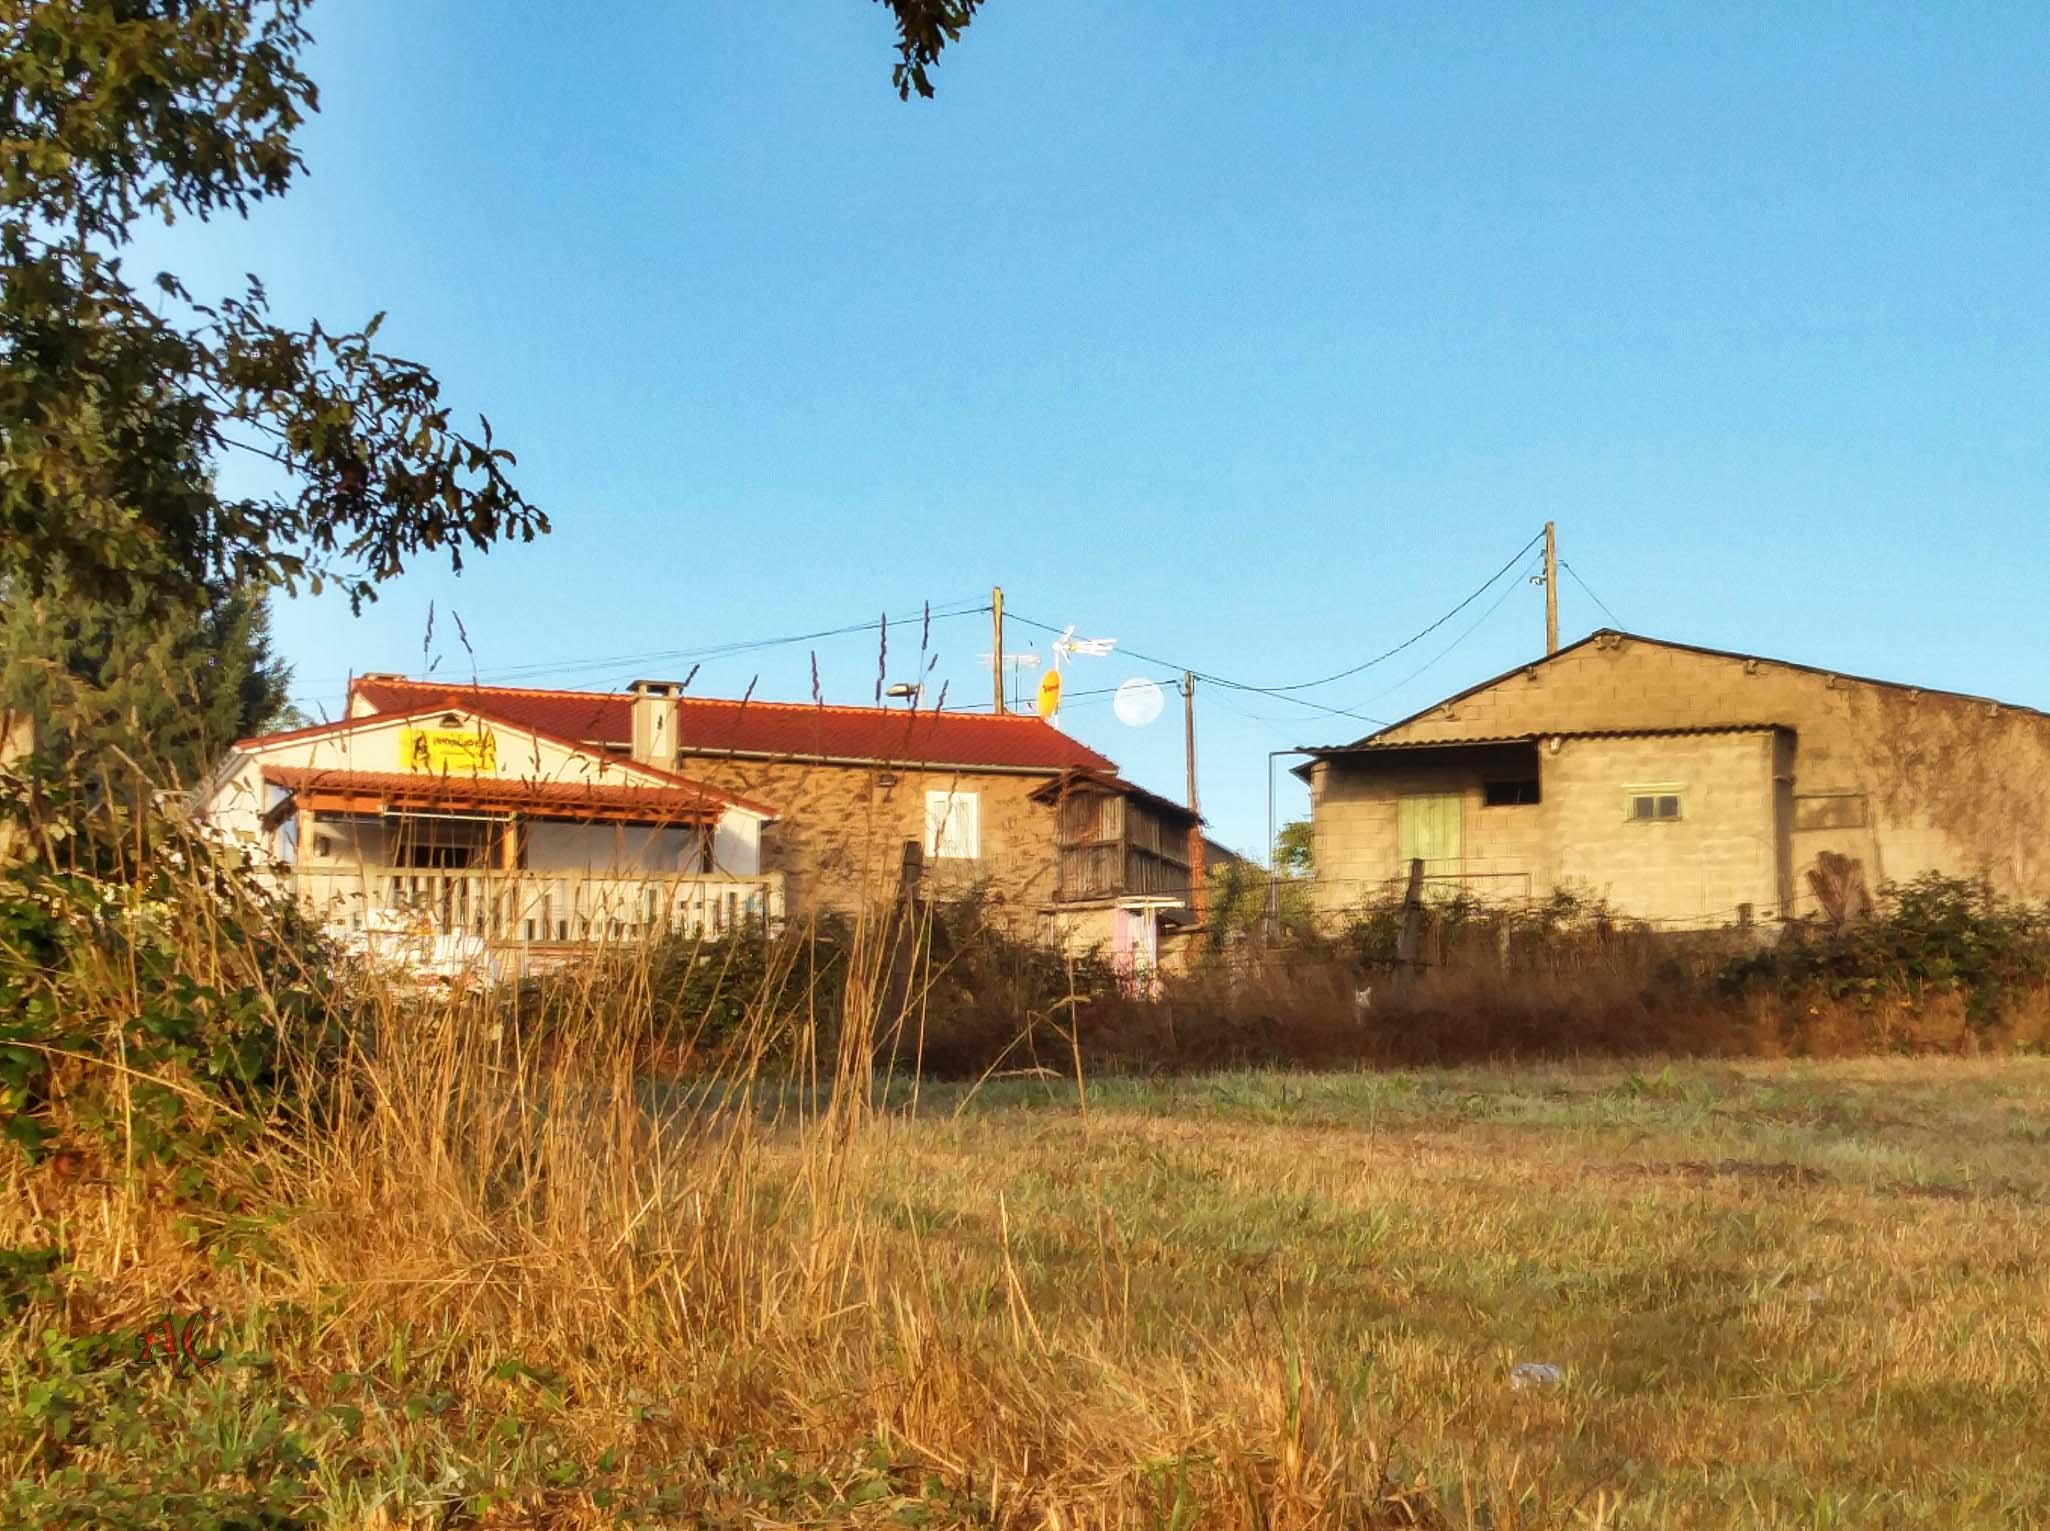 Galeria Fotografica de Mellide a Santa Irene